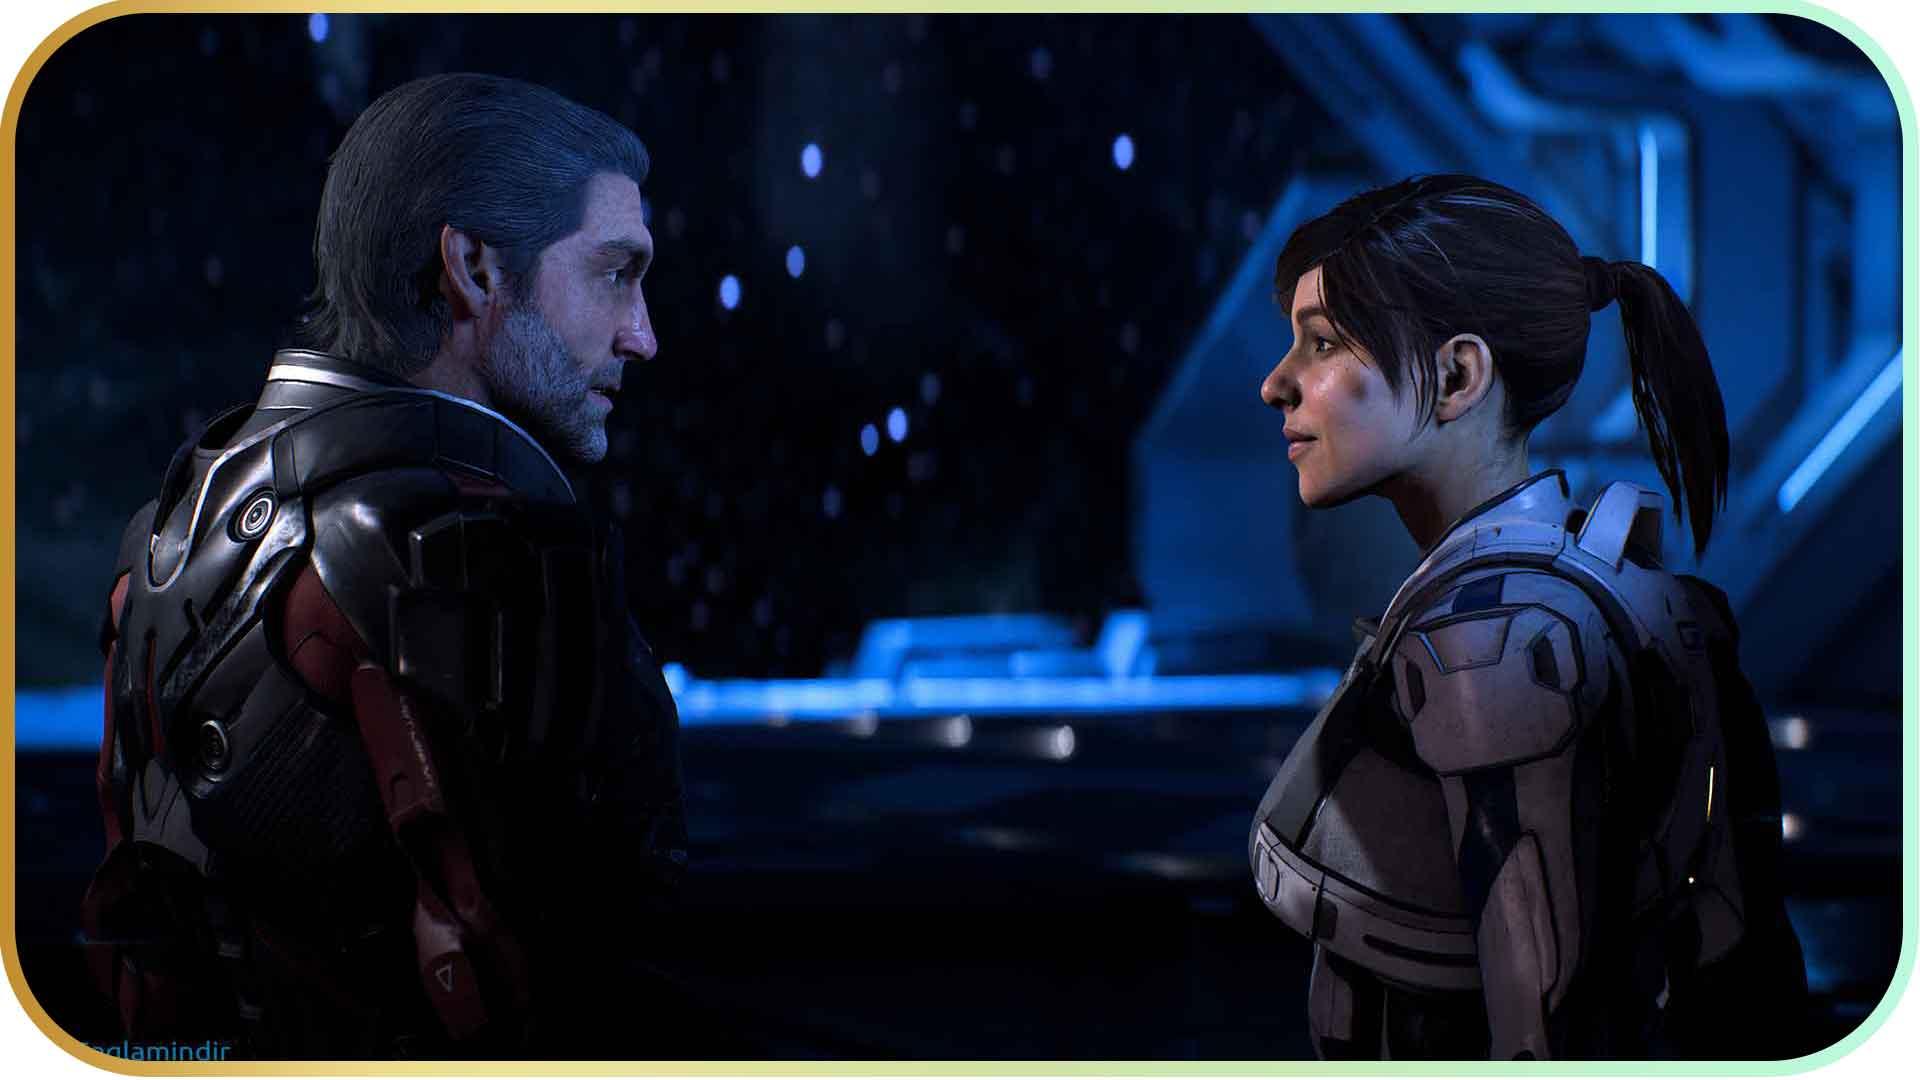 Mass Effect 1 saglamindir